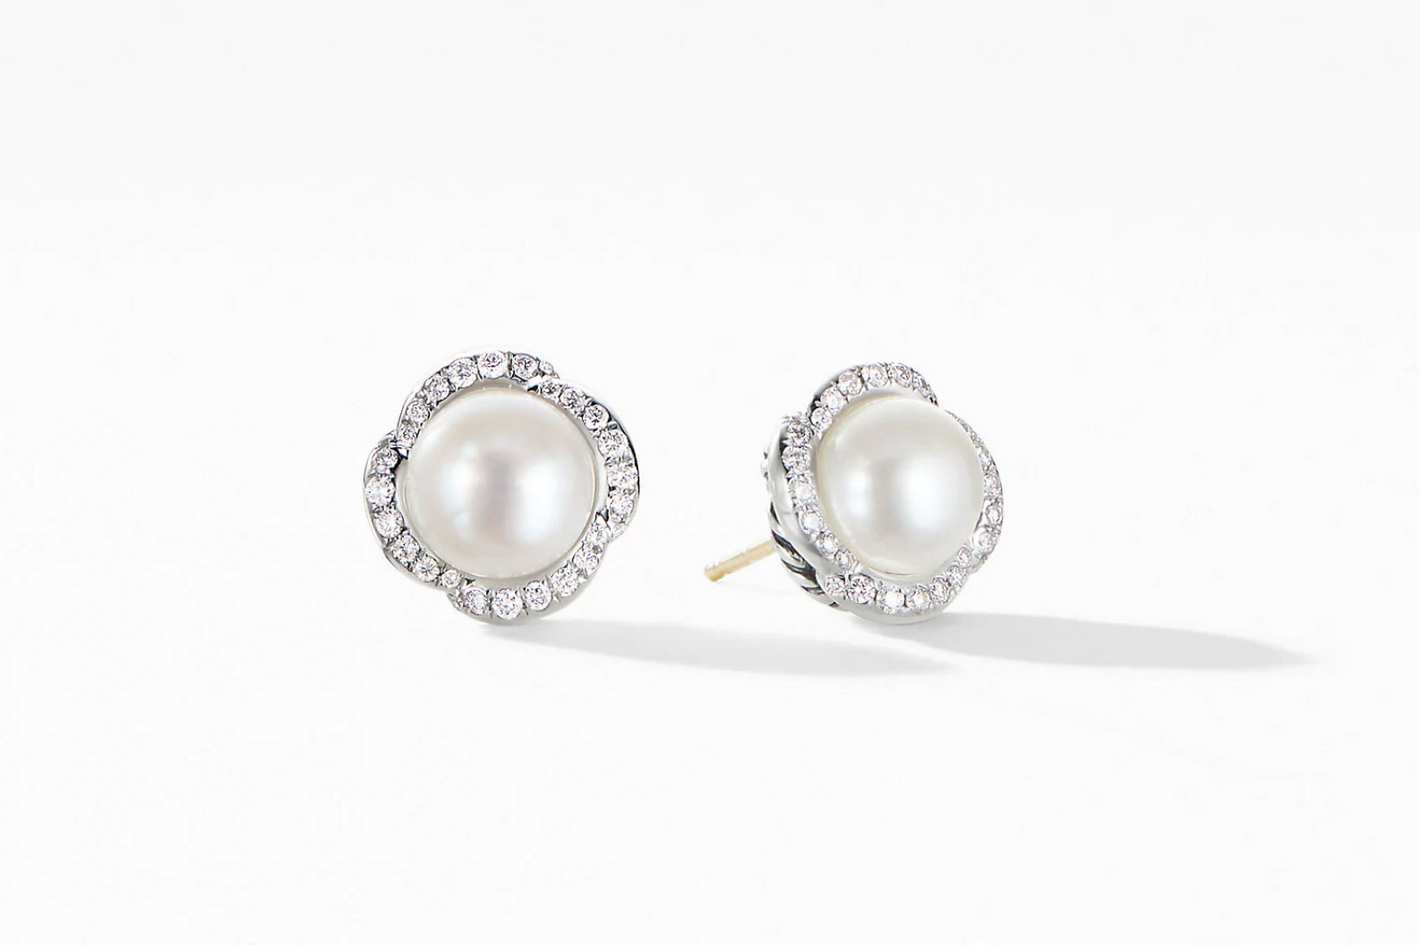 50eded843e6 David Yurman Continuance Pearl Button Earrings With Diamonds